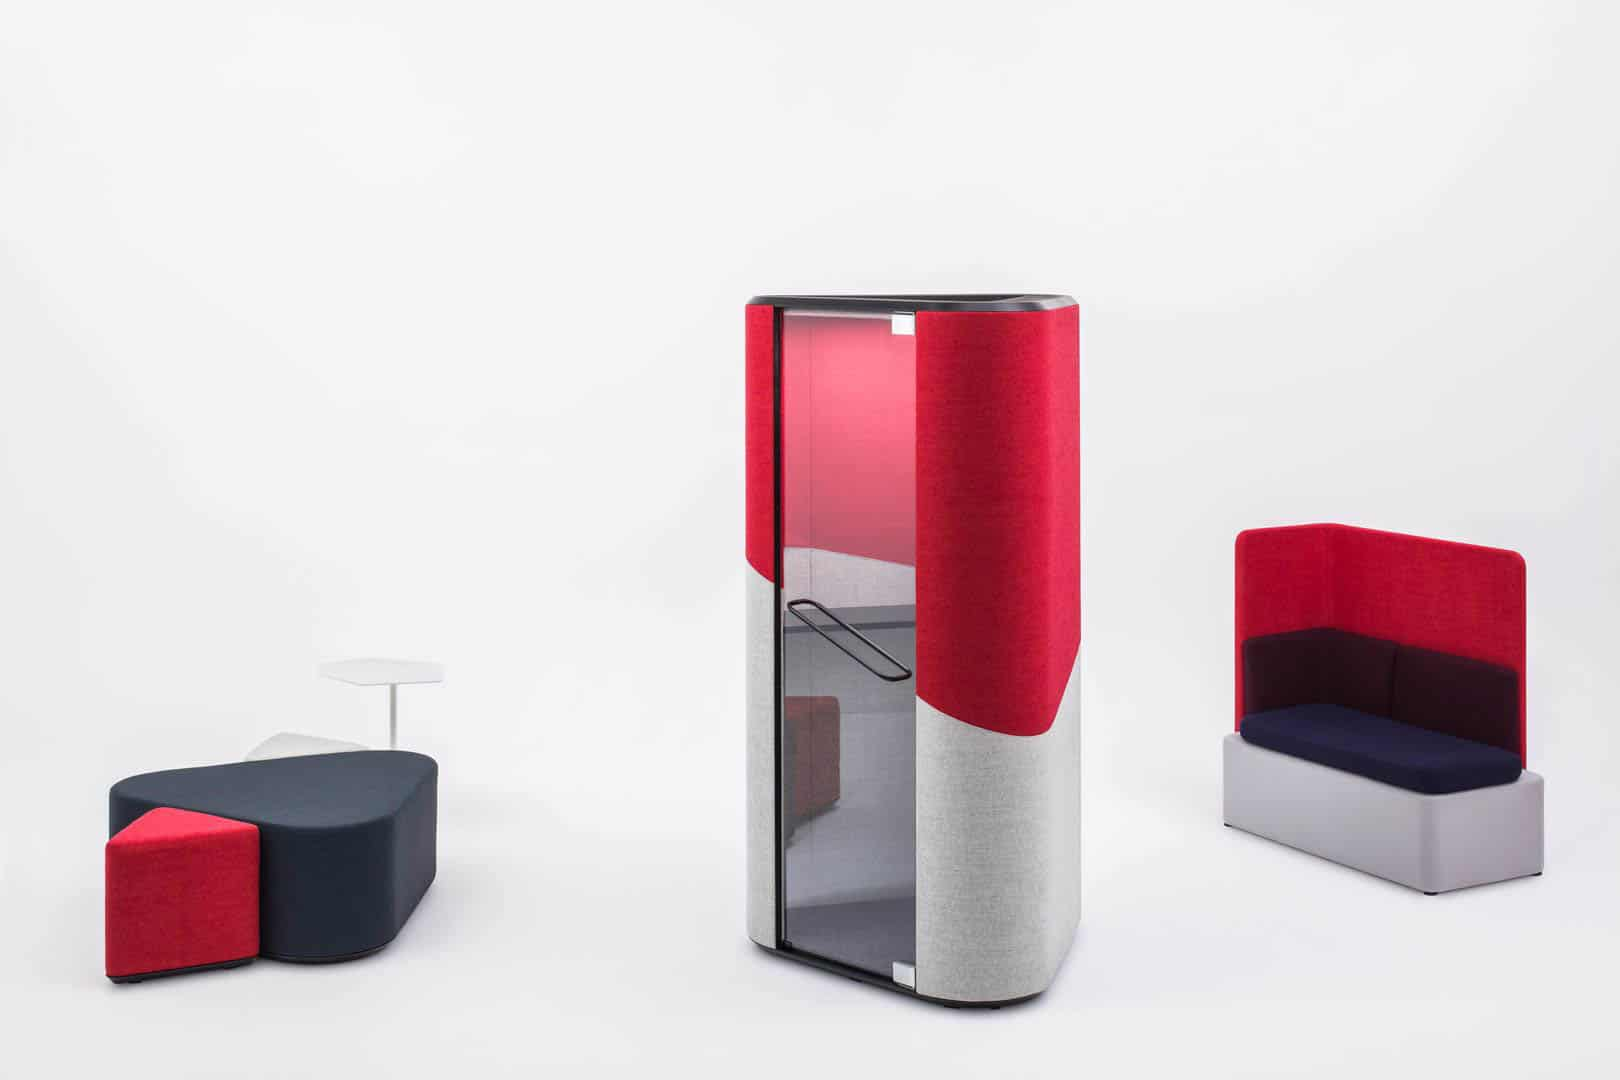 mdd cabine acoustic-pod-Hana avec banquette assortie.jpg